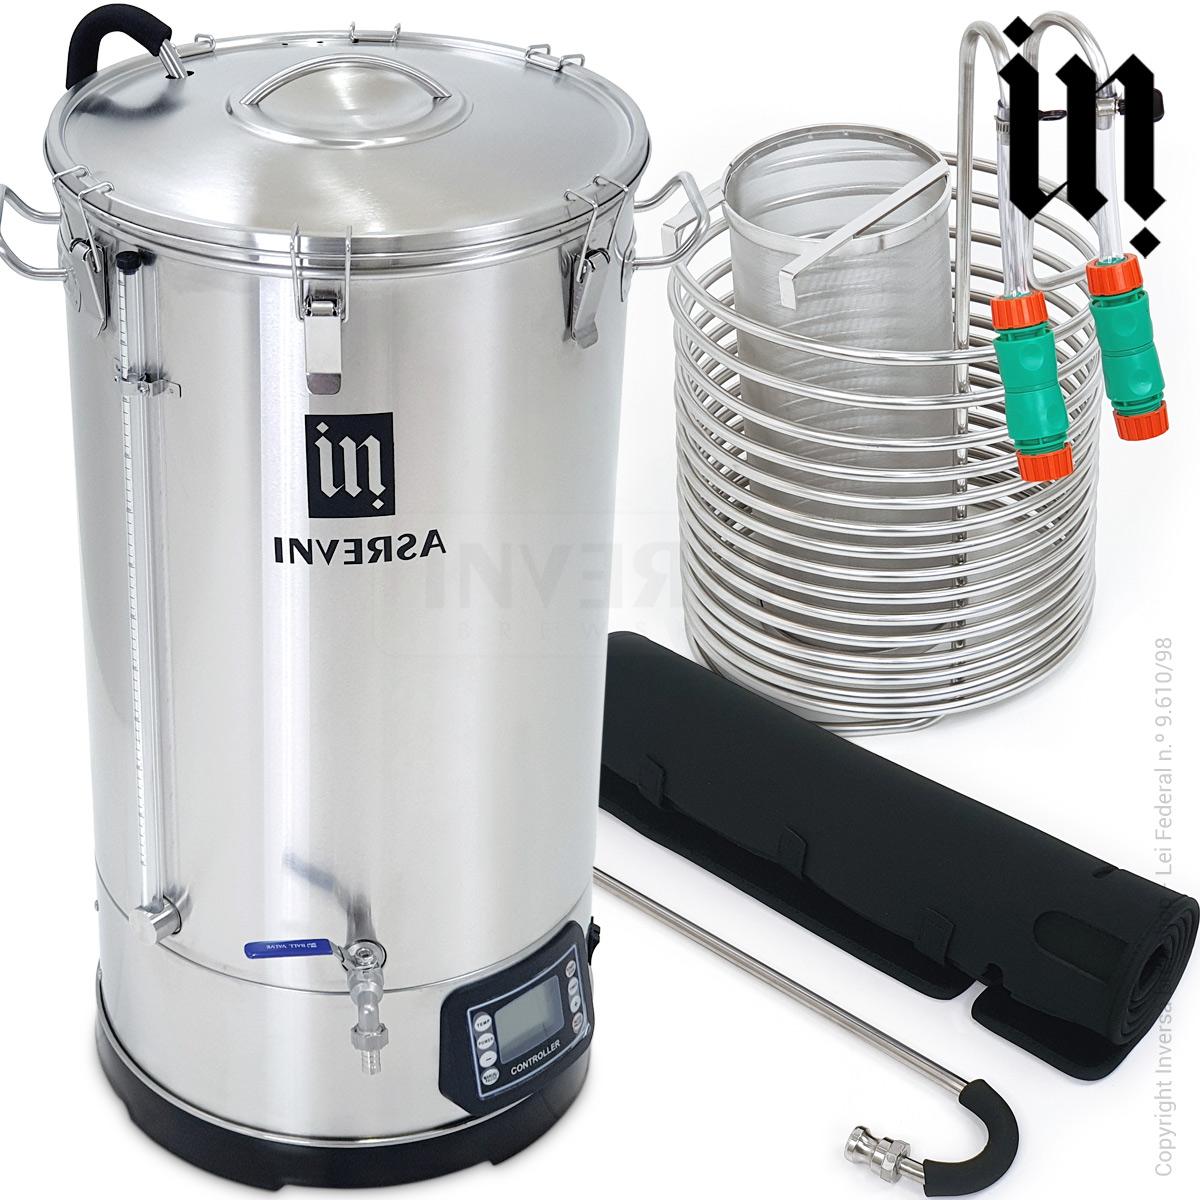 MicroCervejaria Inversa 70 litros (Single Vessel) - Deluxe 2021